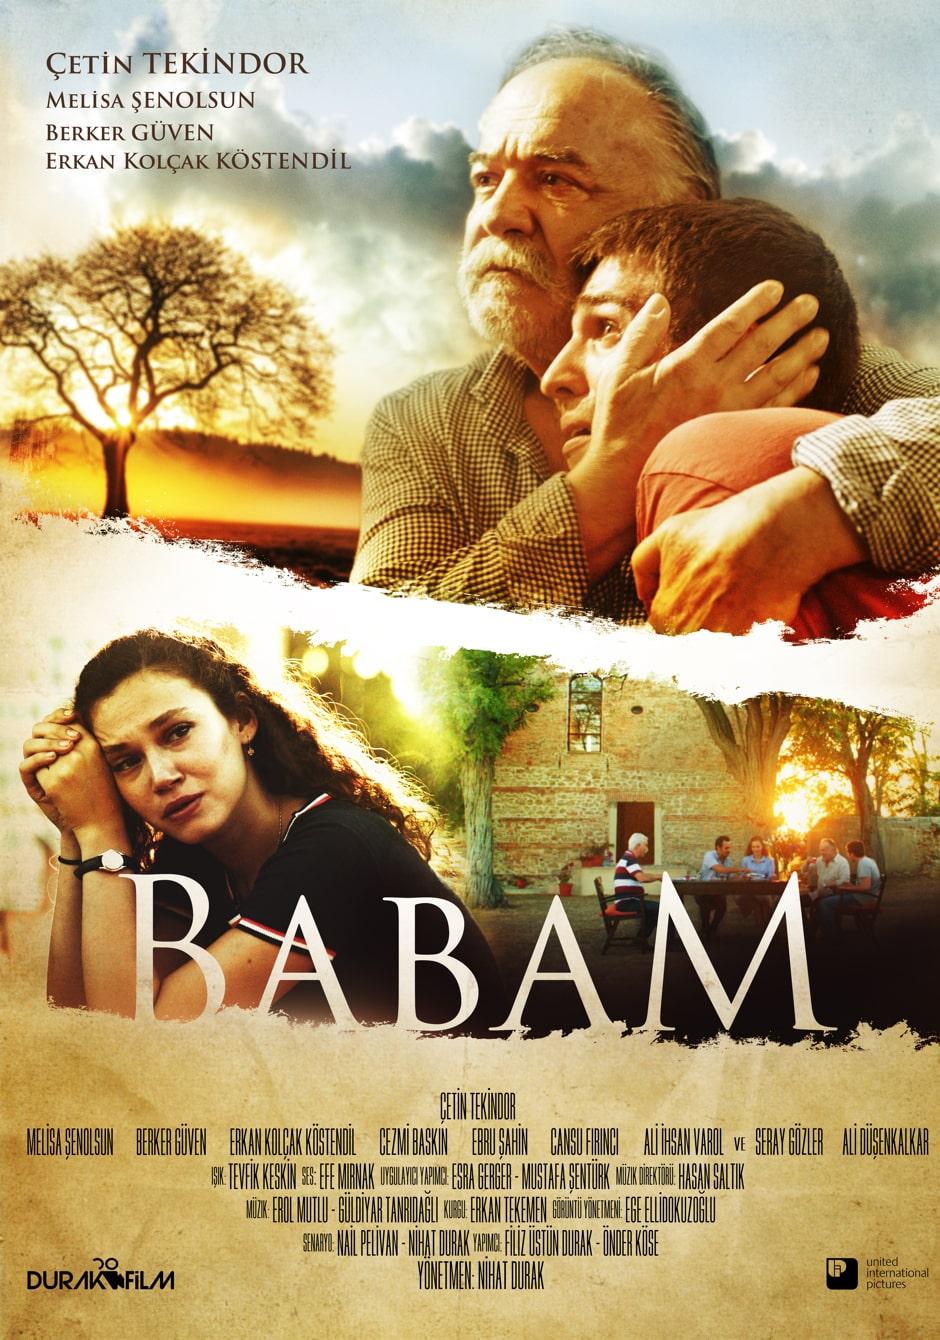 BABAM Copy-min